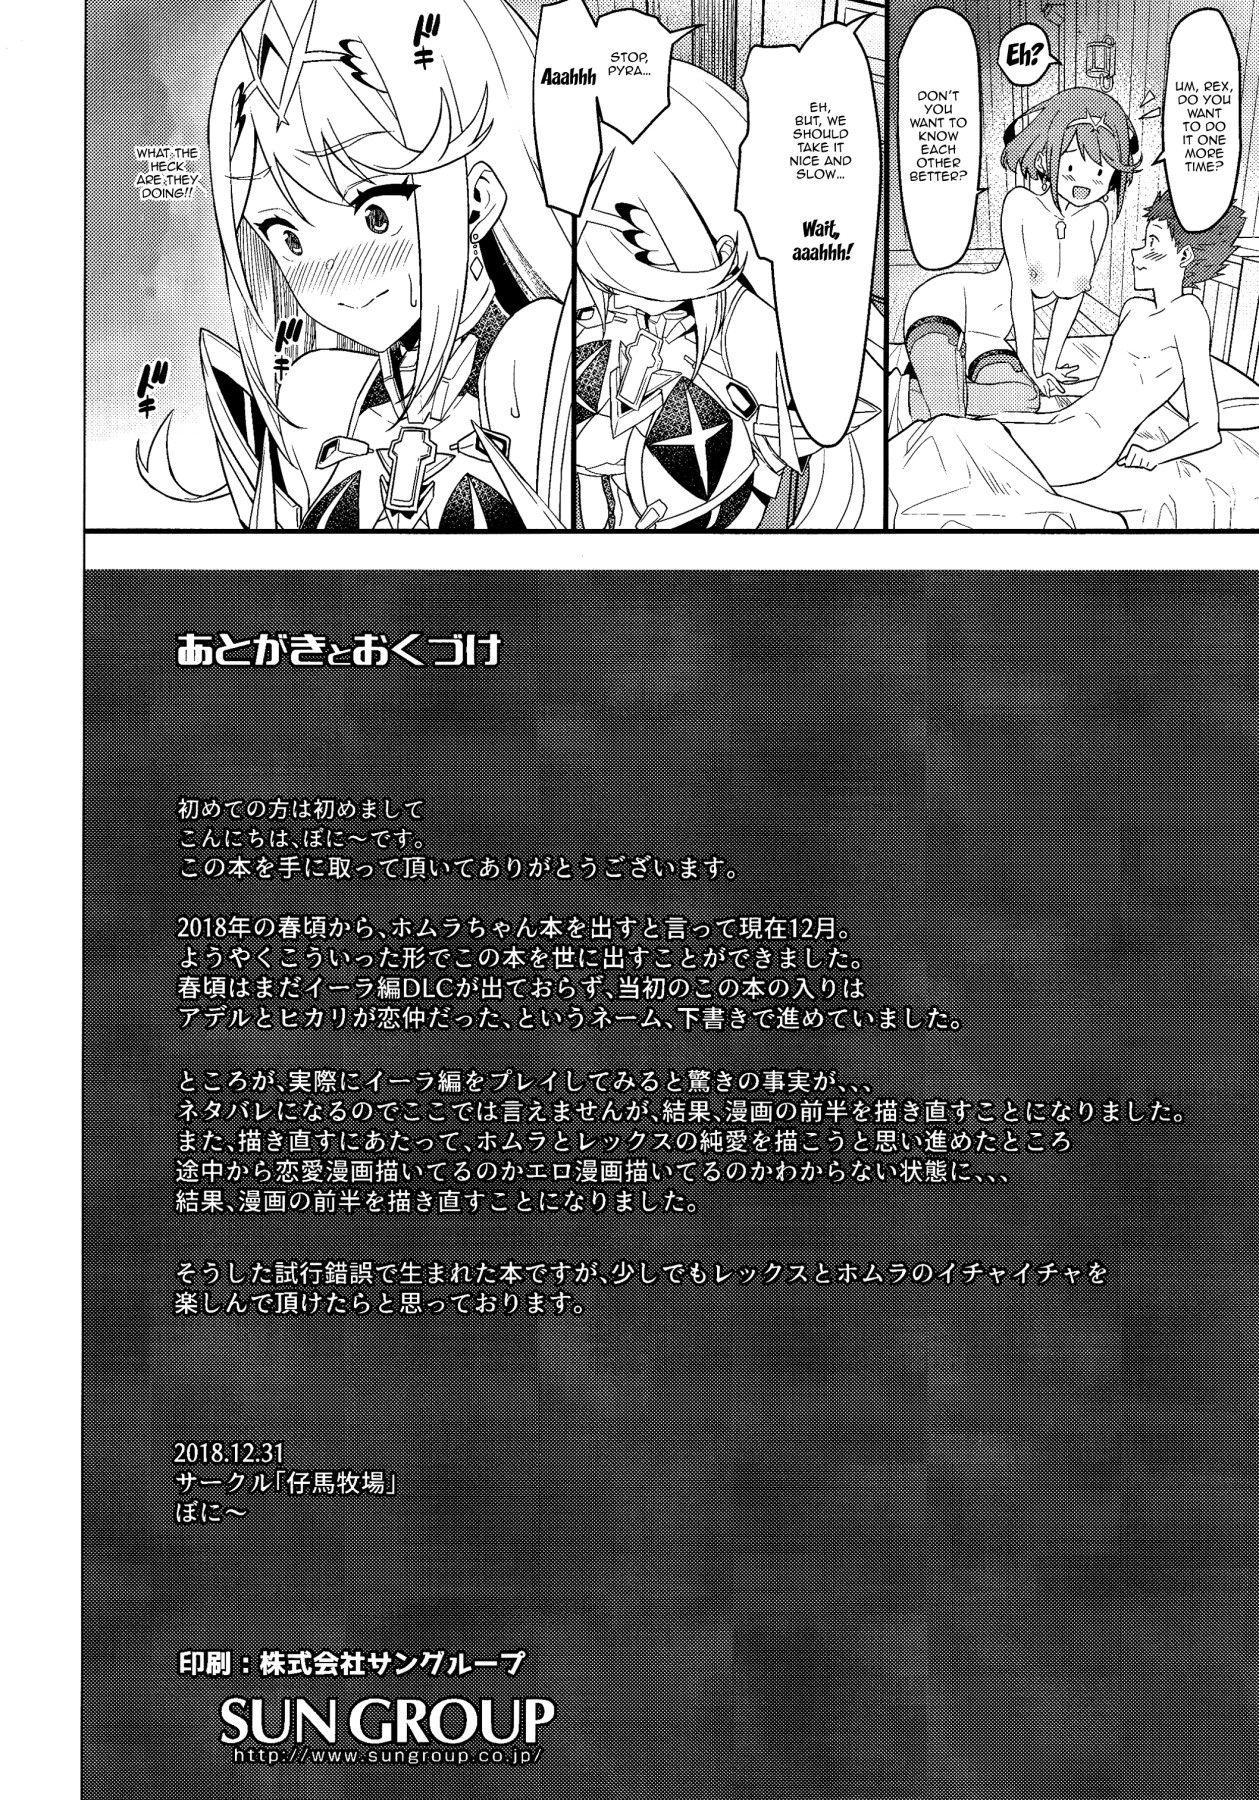 Chouyou no Naka e to   In The Morning Light 28